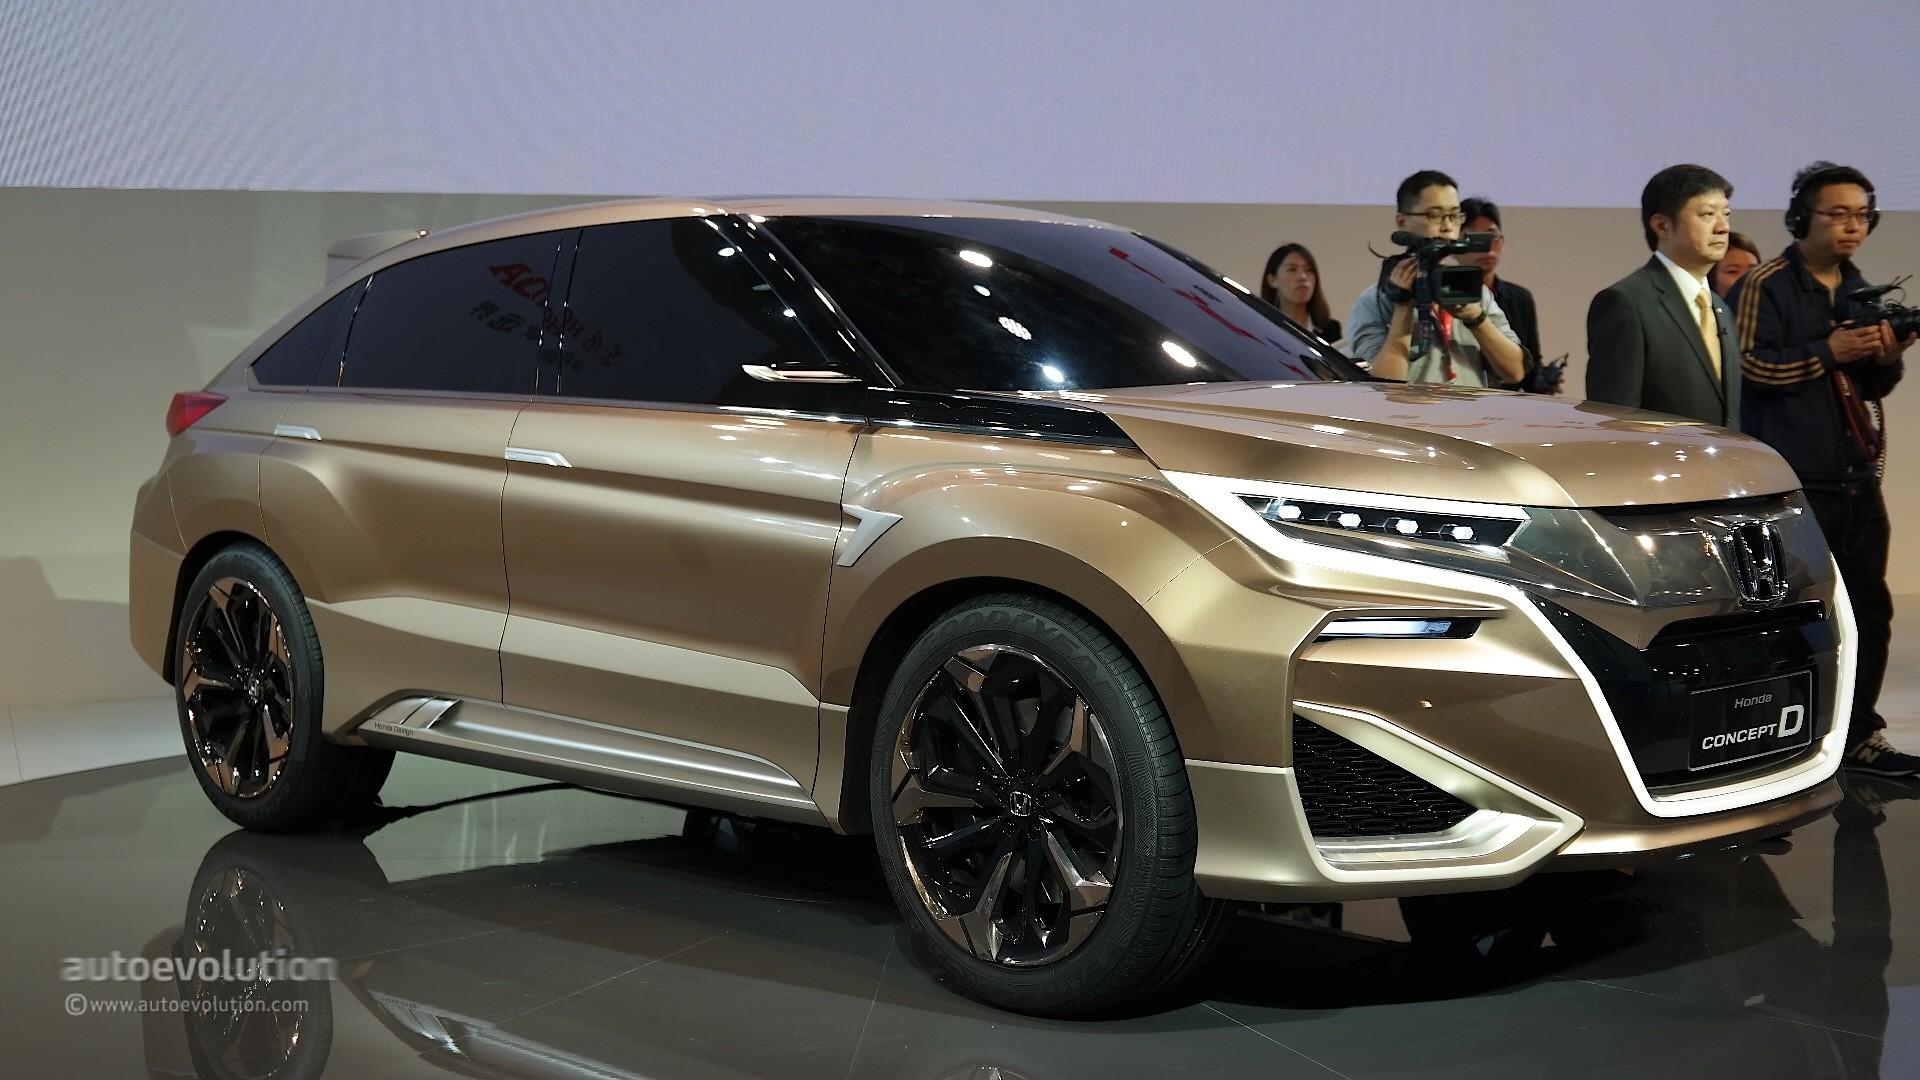 Honda Ur V To Debut At 2016 Beijing Motor Show Autoevolution